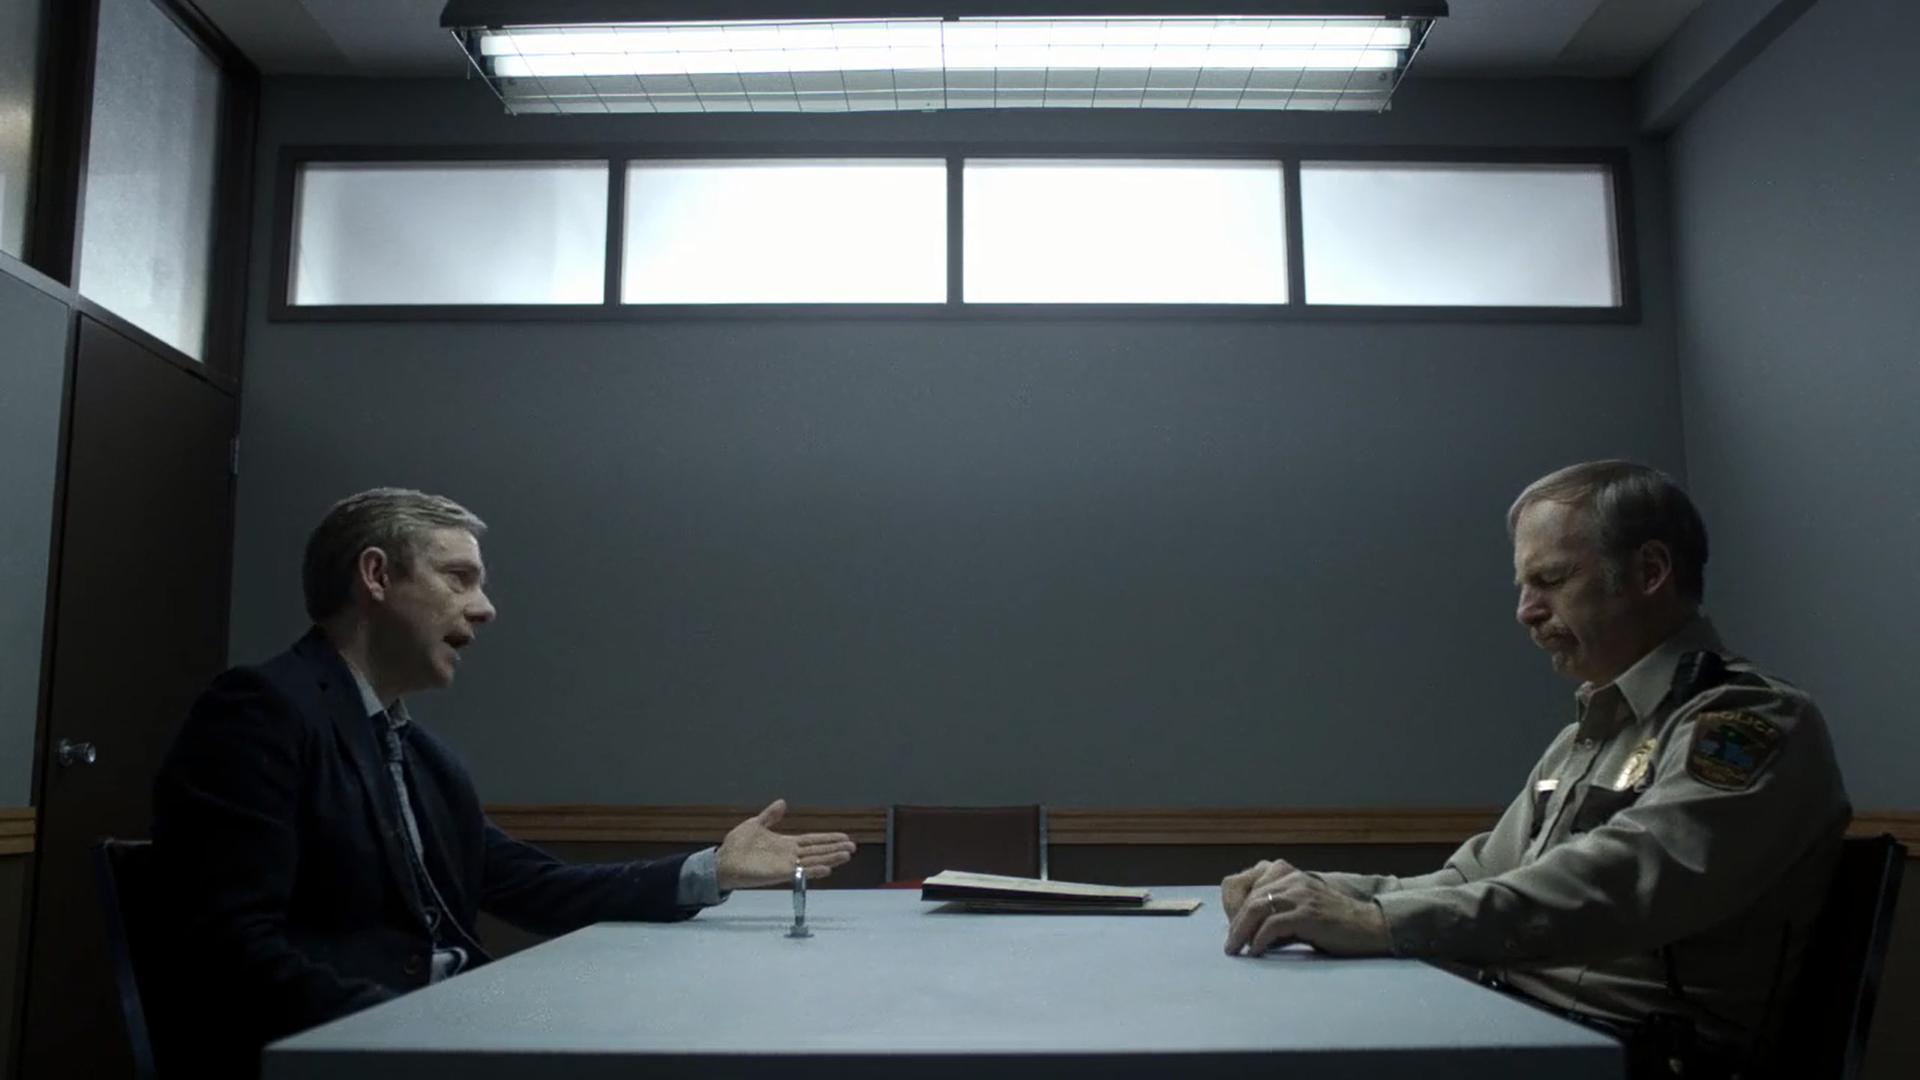 Fargo 2x09 Motel Shootout Scene Part e 1080p